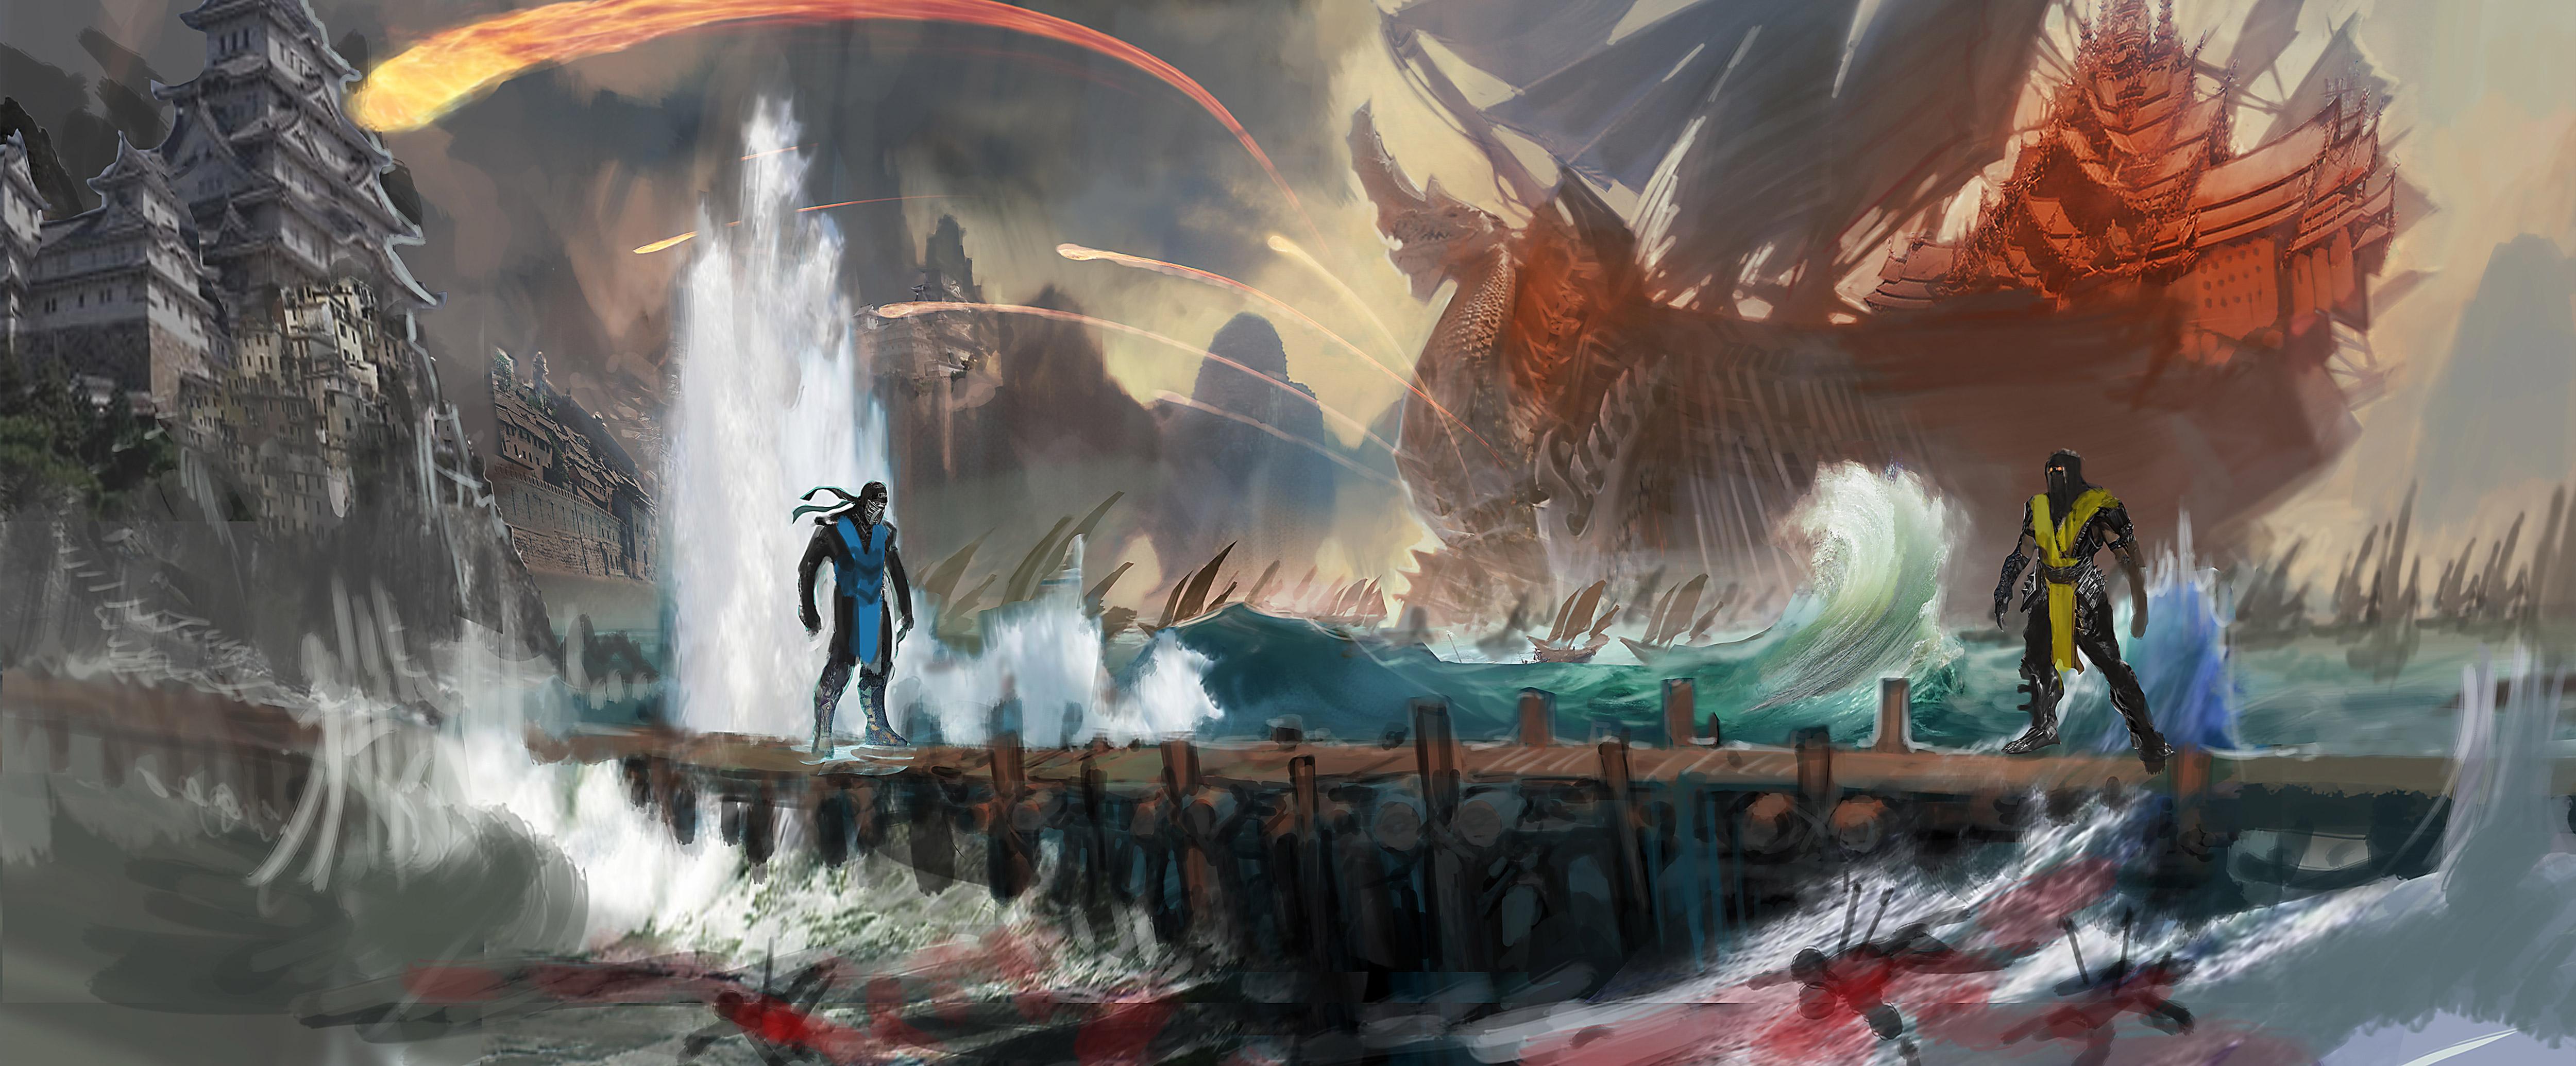 Mk11 4k Wallpaper: Mortal Kombat X HD Wallpaper